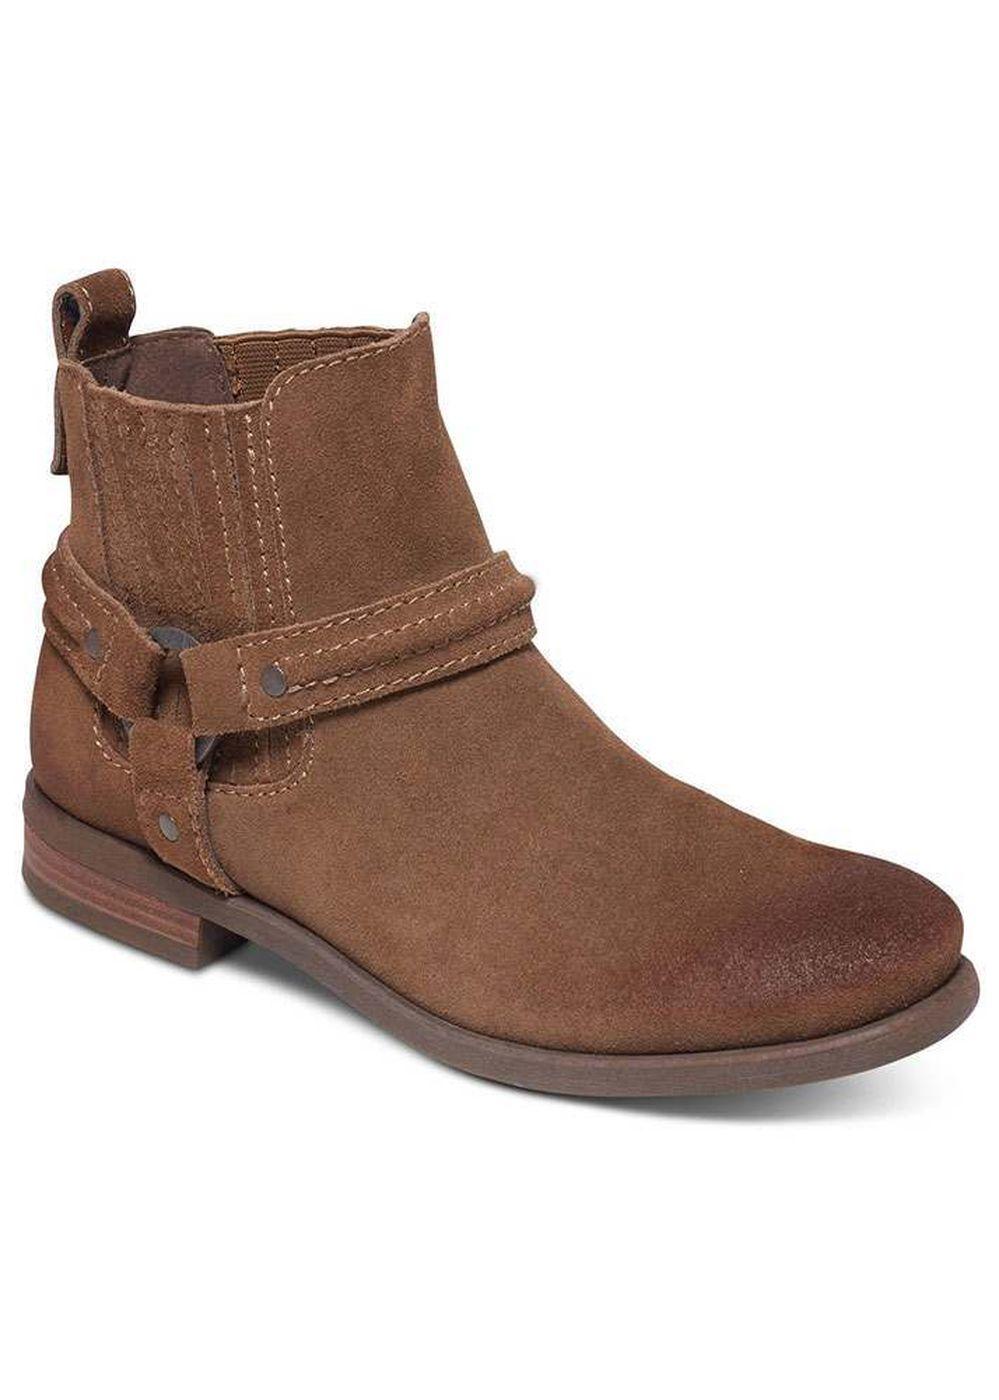 roxy-axle-boots-chocolate